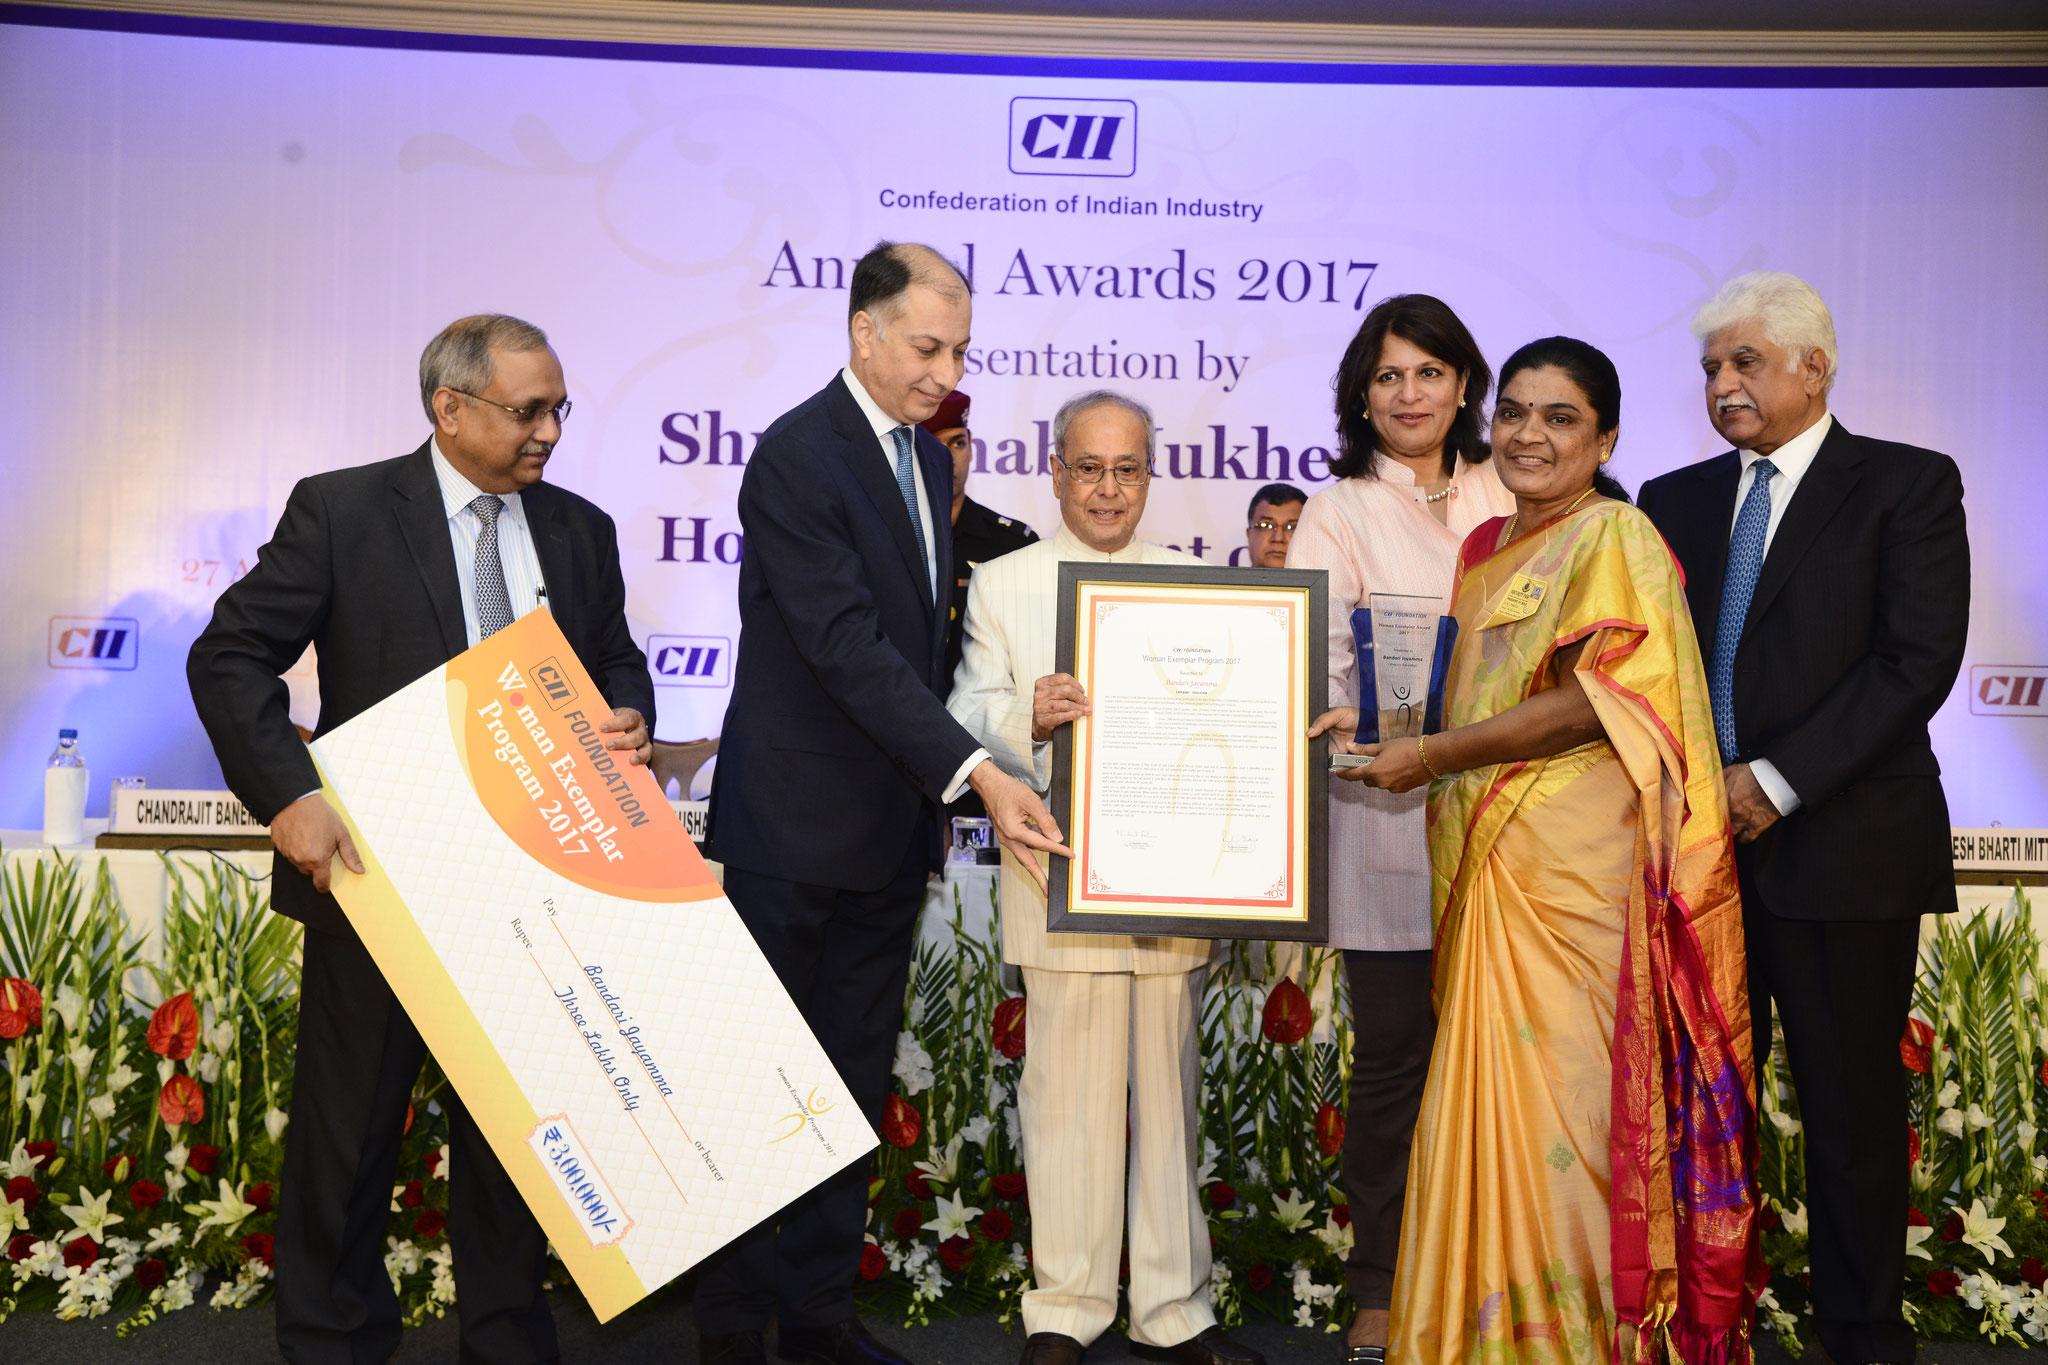 Ms.B.Jayamma,President -CMM receives CII Woman Exemplar Award 2017 by the hands of Shri.Pranab Mukherjee,Hon'ble President of India on April.27.2017 at Hotel ITC Maurya ,New Delhi.